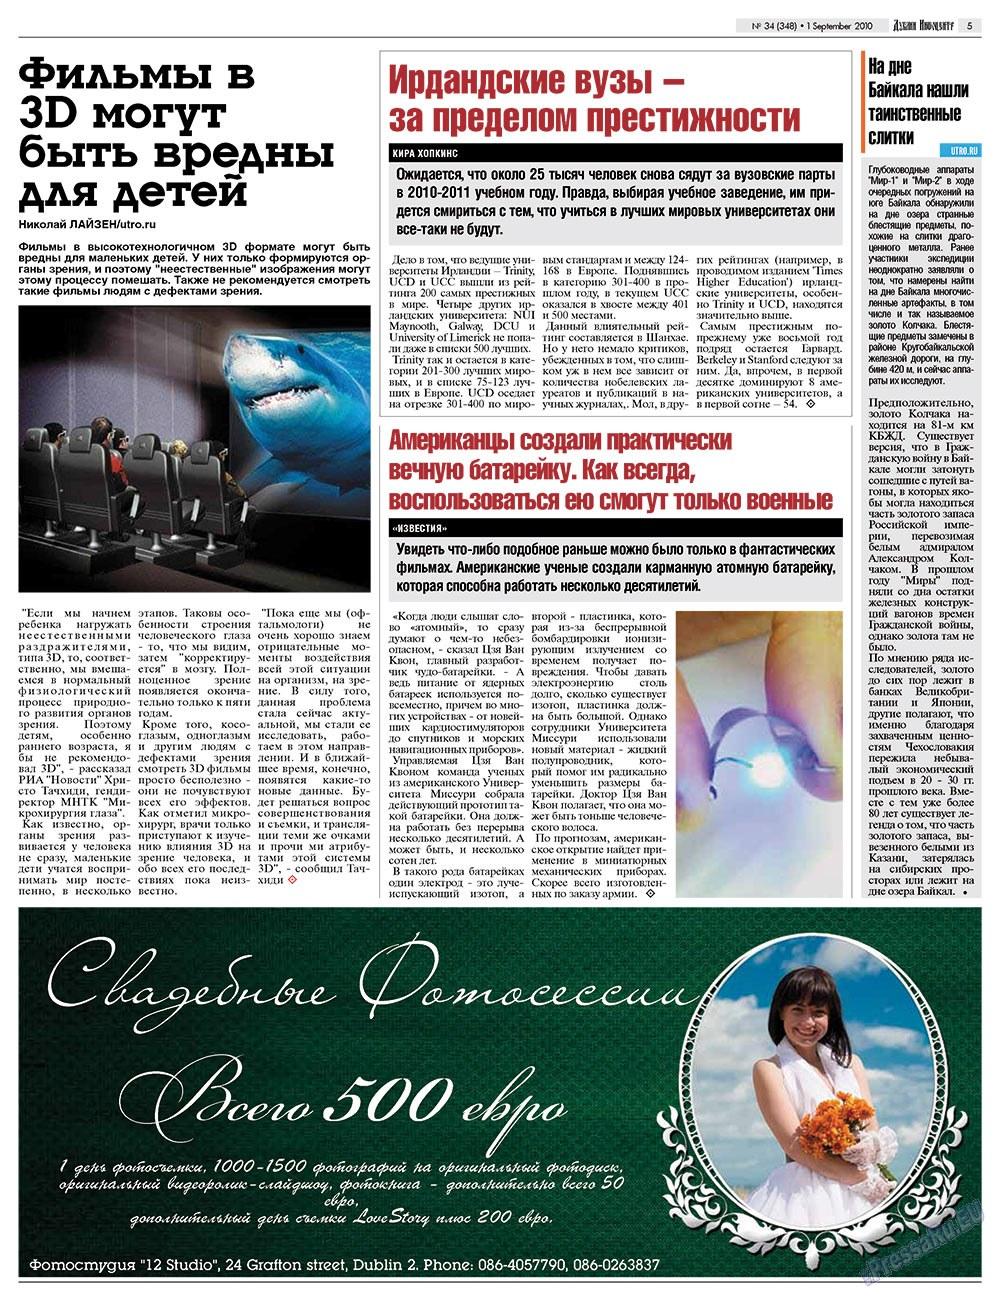 Дублин инфоцентр (газета). 2010 год, номер 34, стр. 5